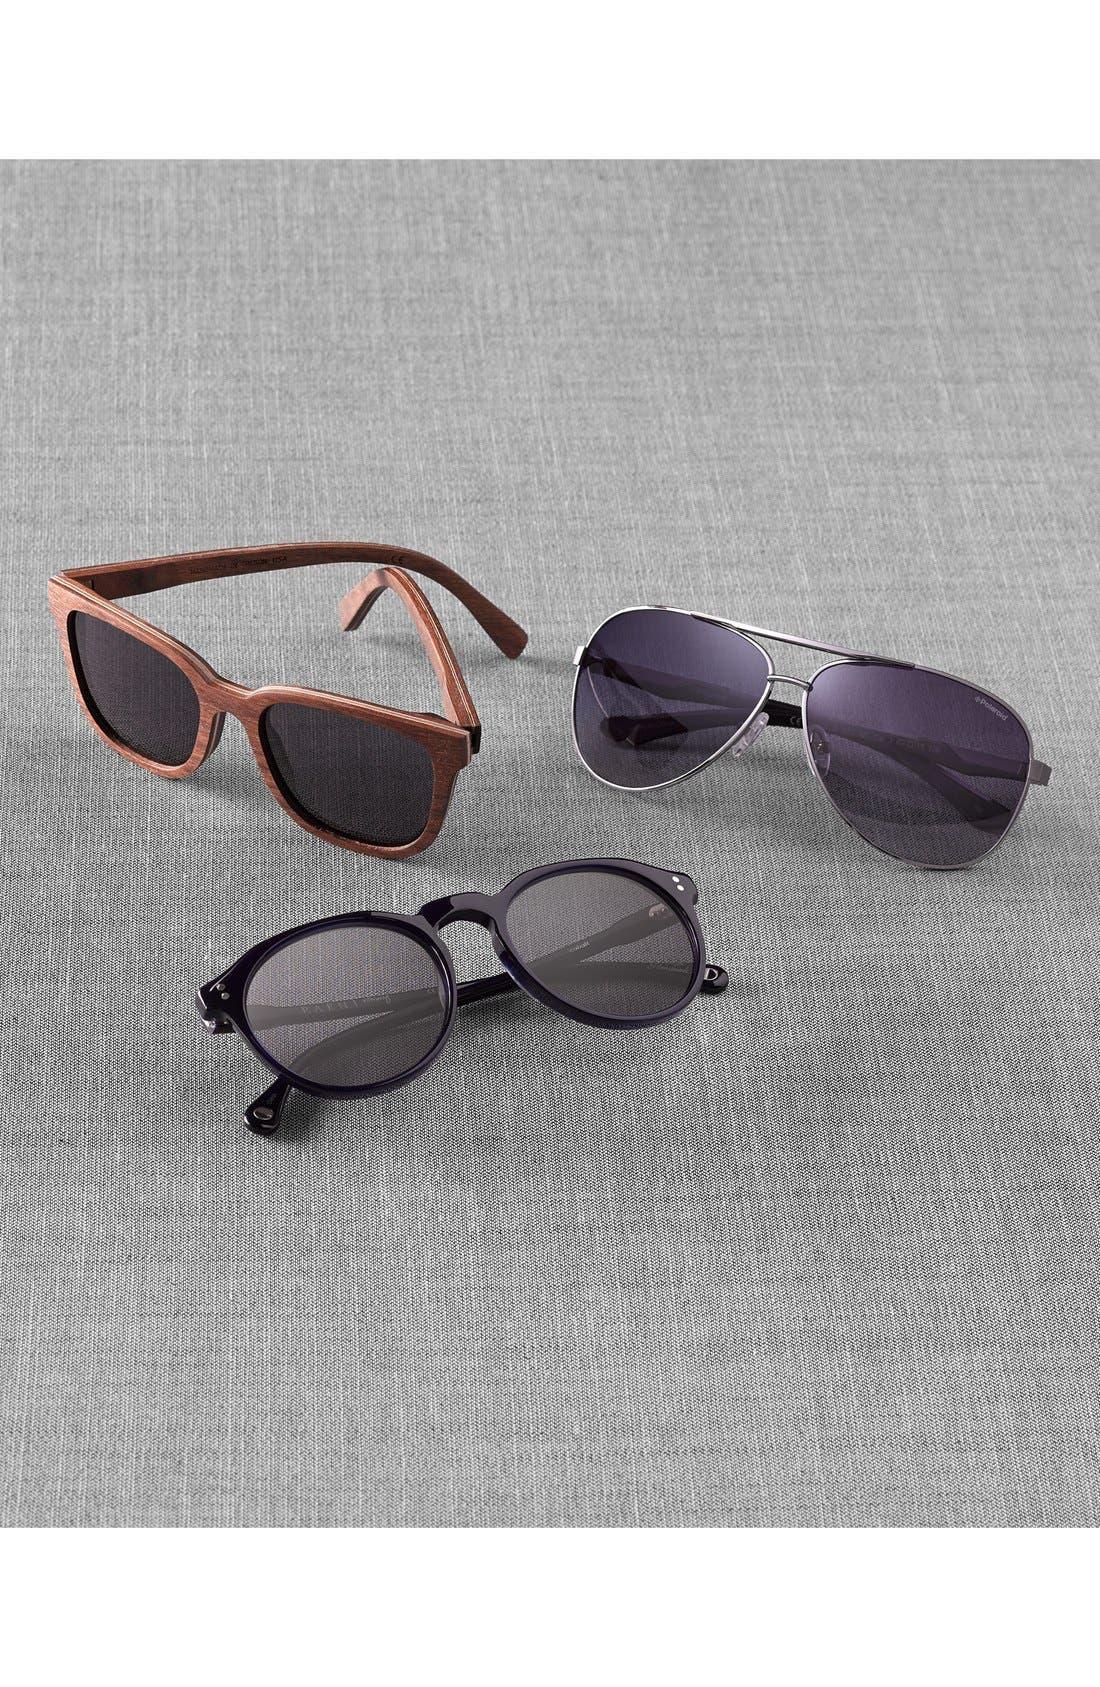 'Prescott' 53mm Wood Sunglasses,                             Alternate thumbnail 2, color,                             WALNUT/ GREY